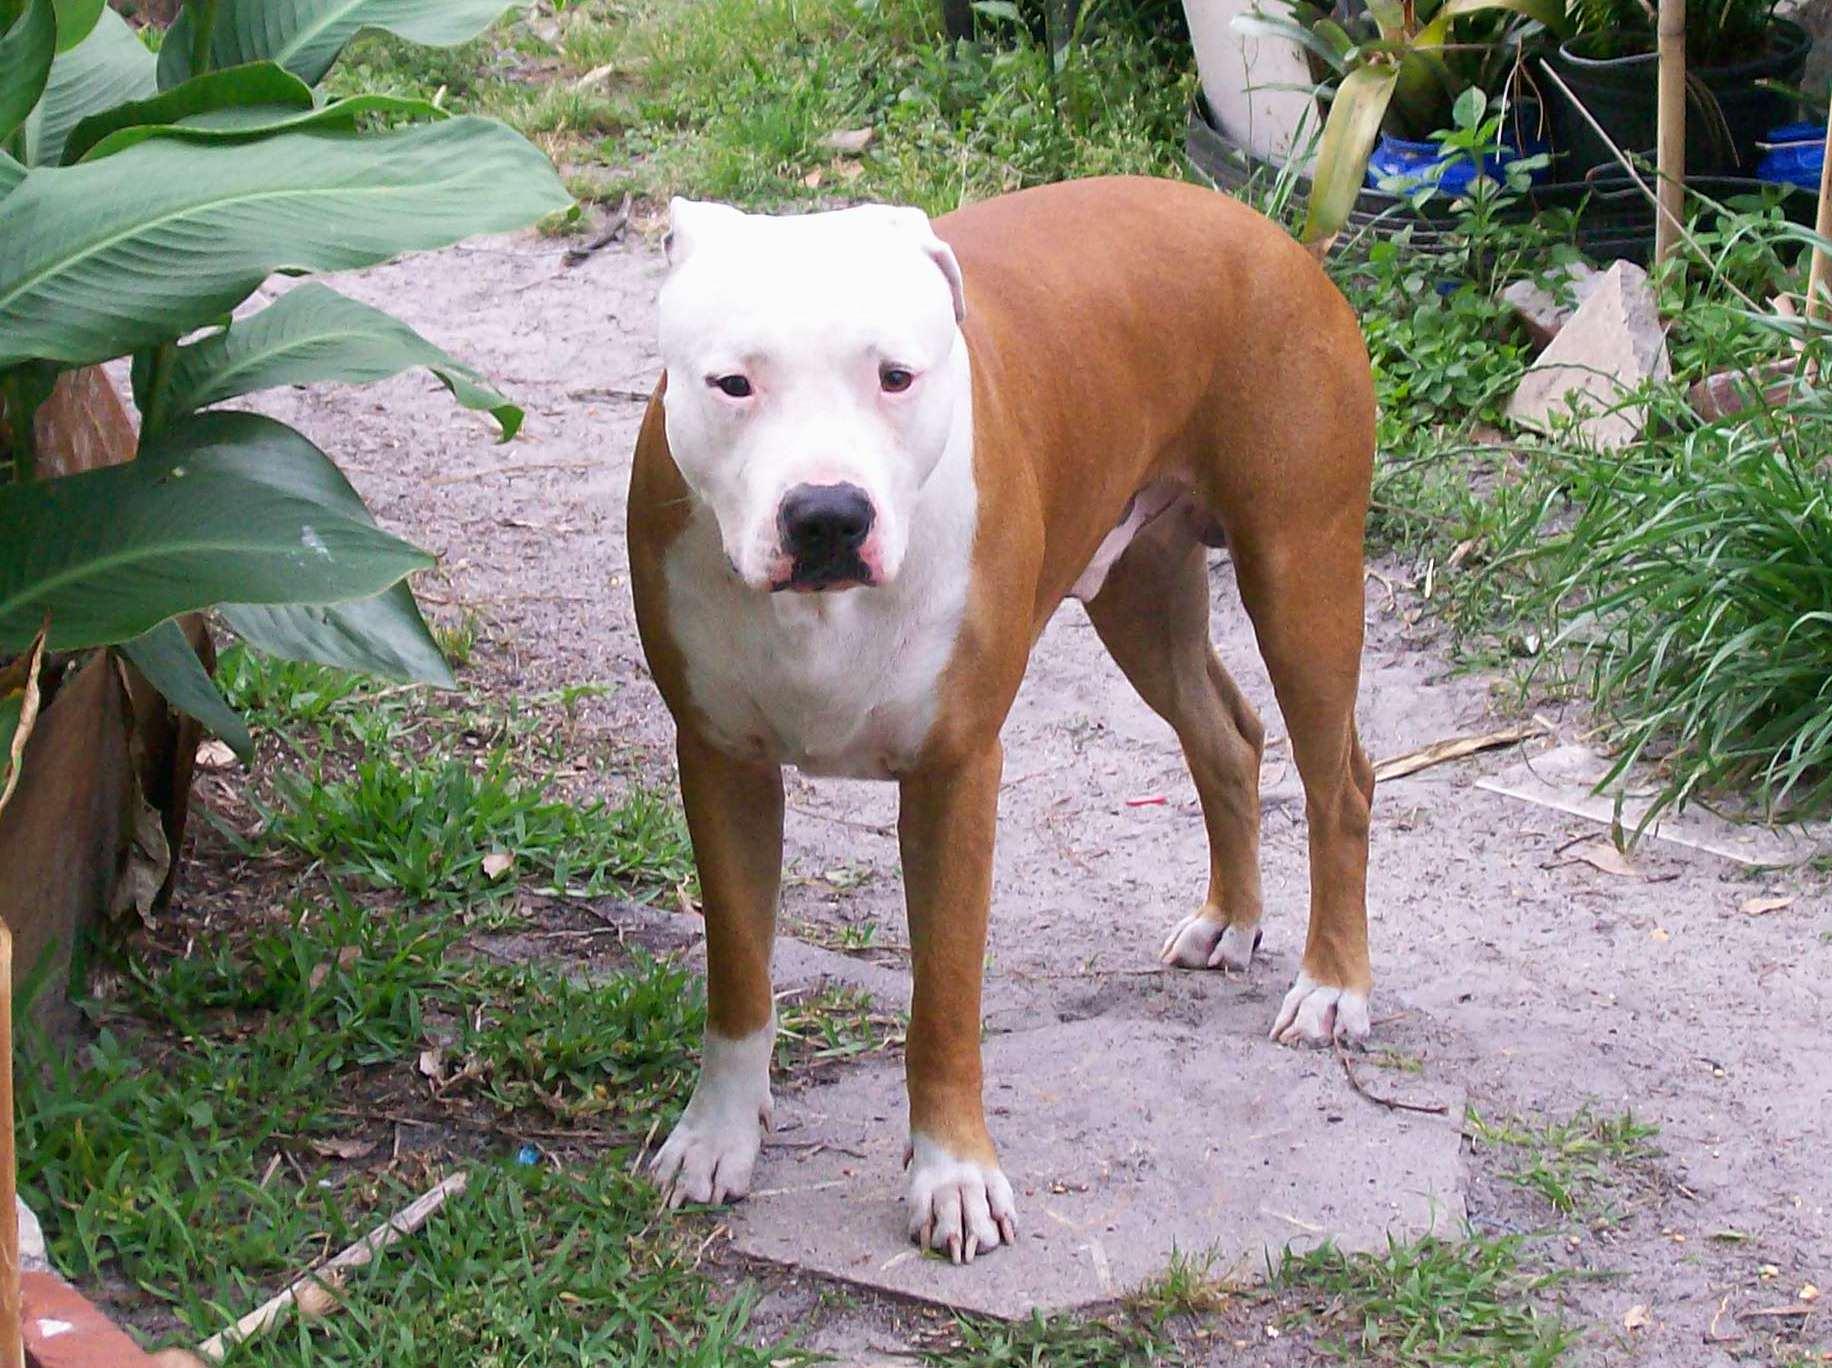 American Pit Bull Terrier Full hd wallpapers